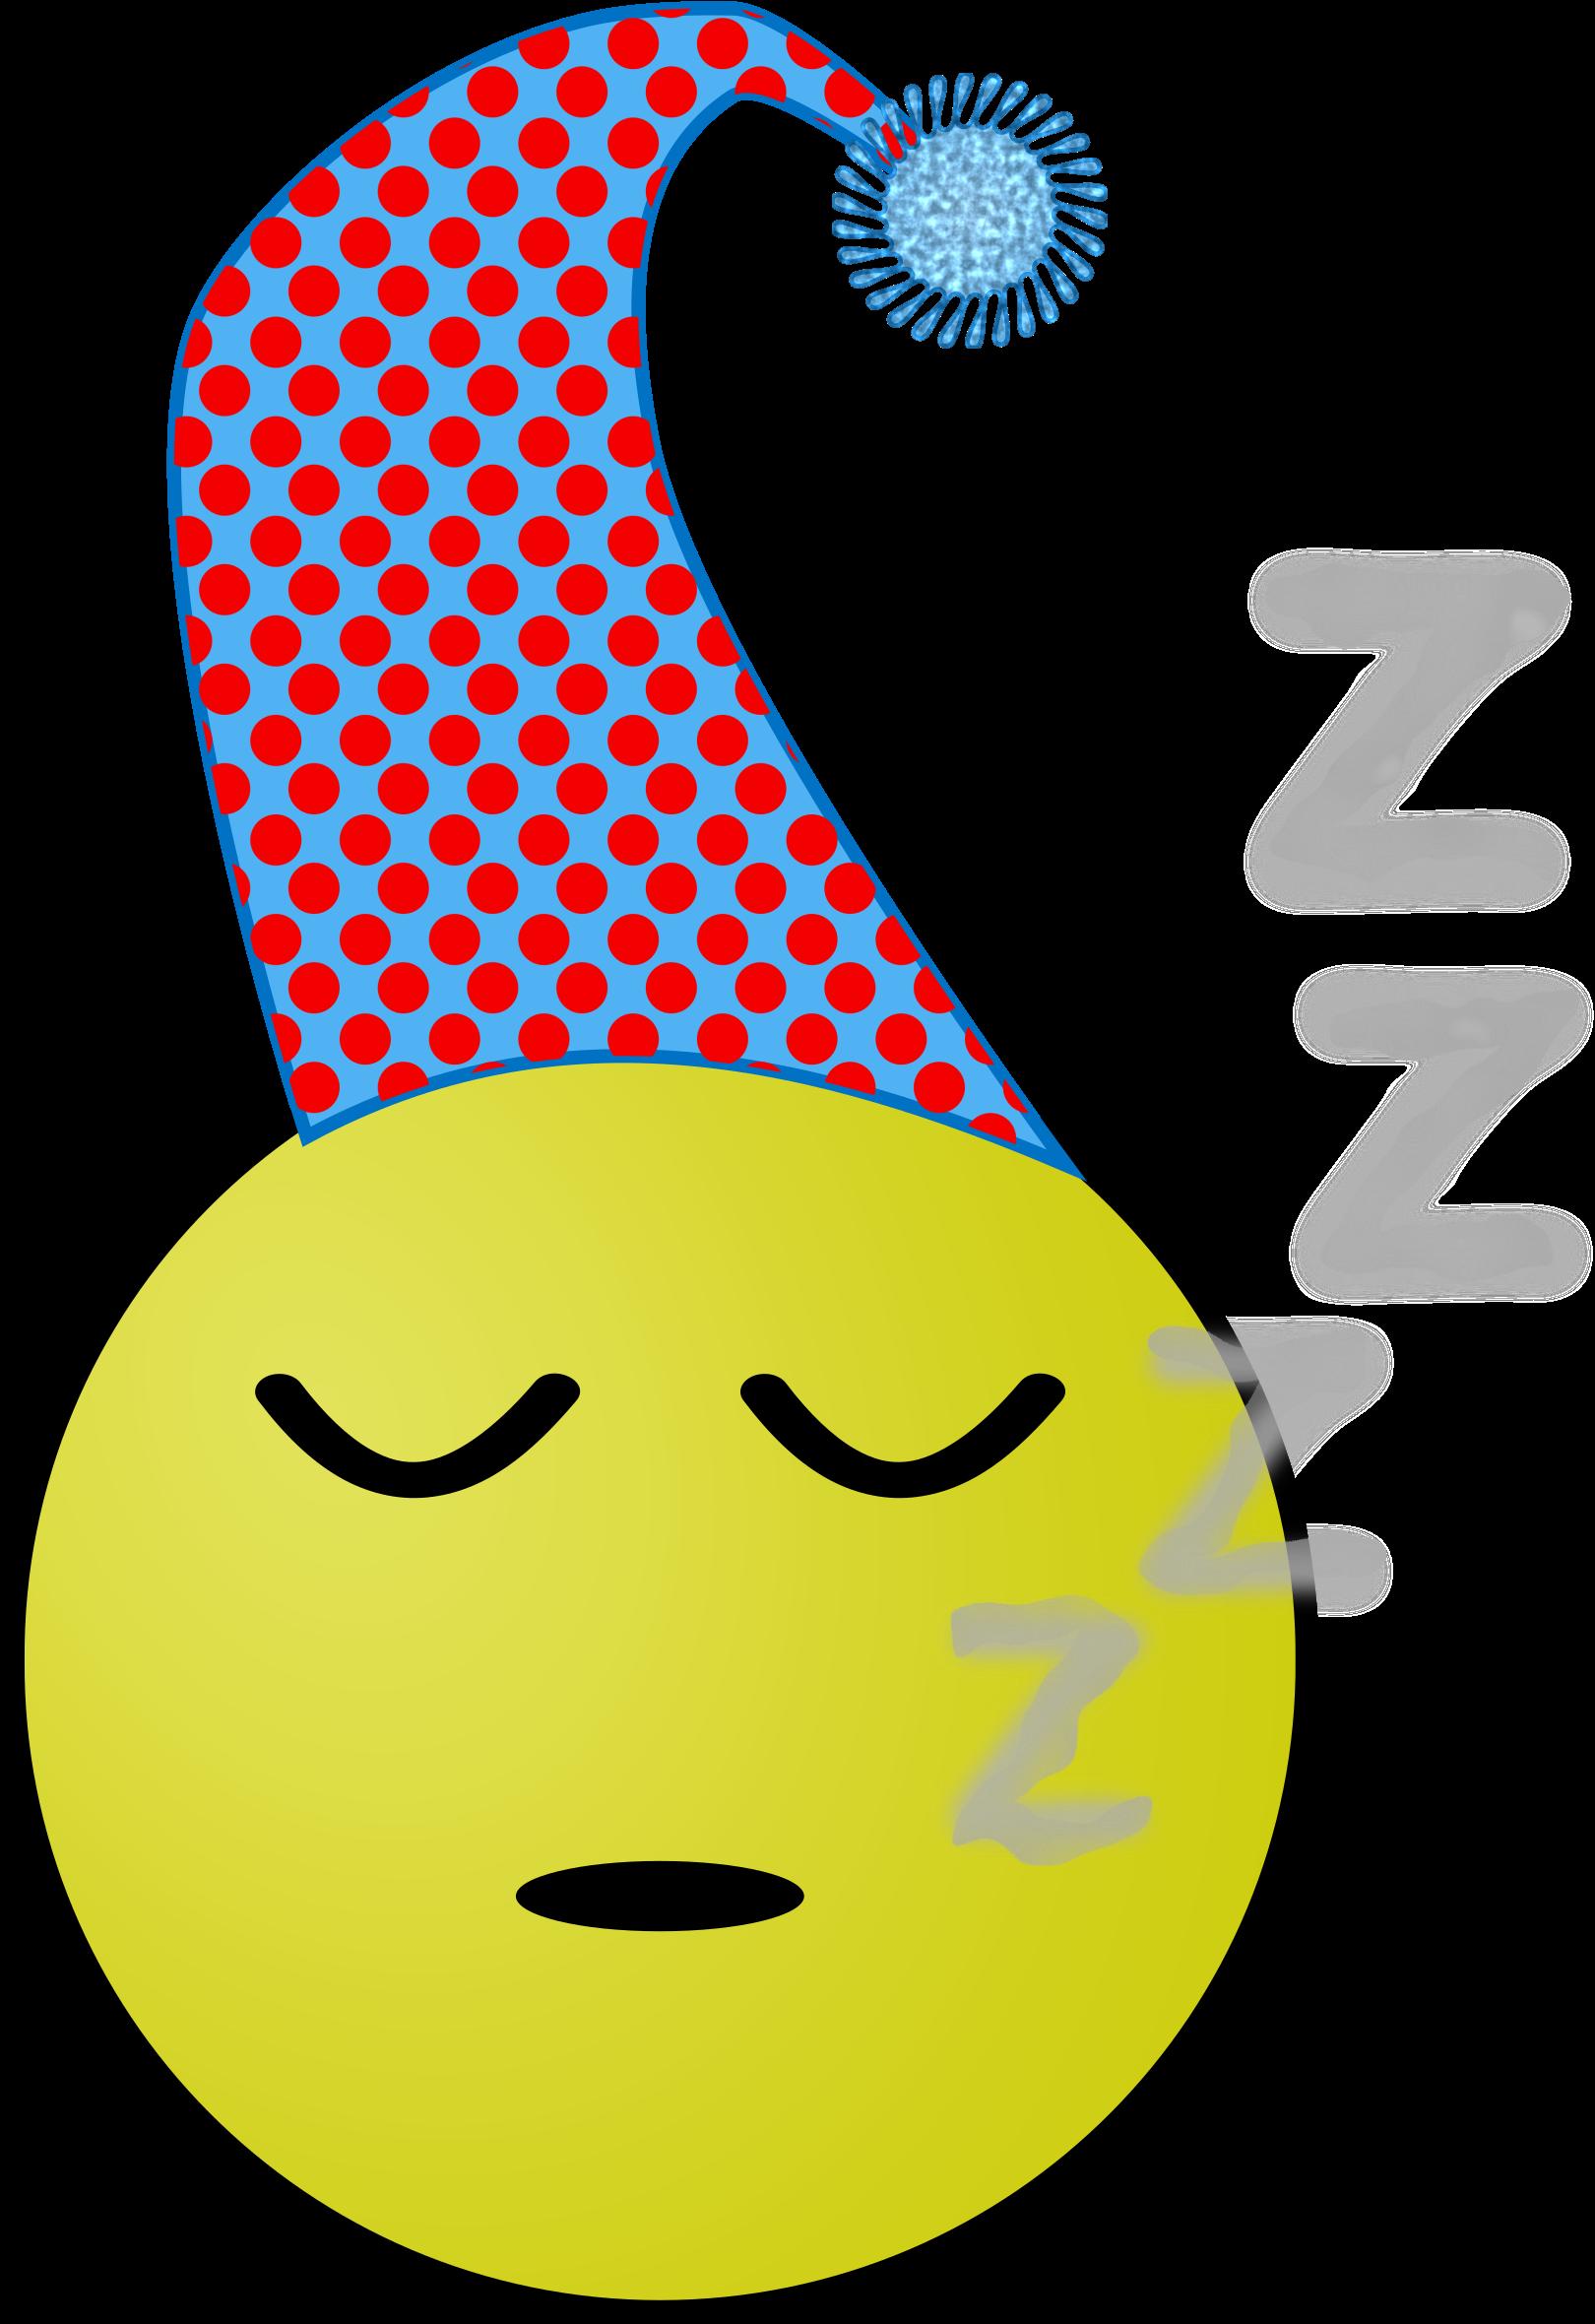 Download Cat Emoji Emoticon Sleep Sleepy Smiley Icon Mug Manchester United Png Image With No Background Pngkey Com